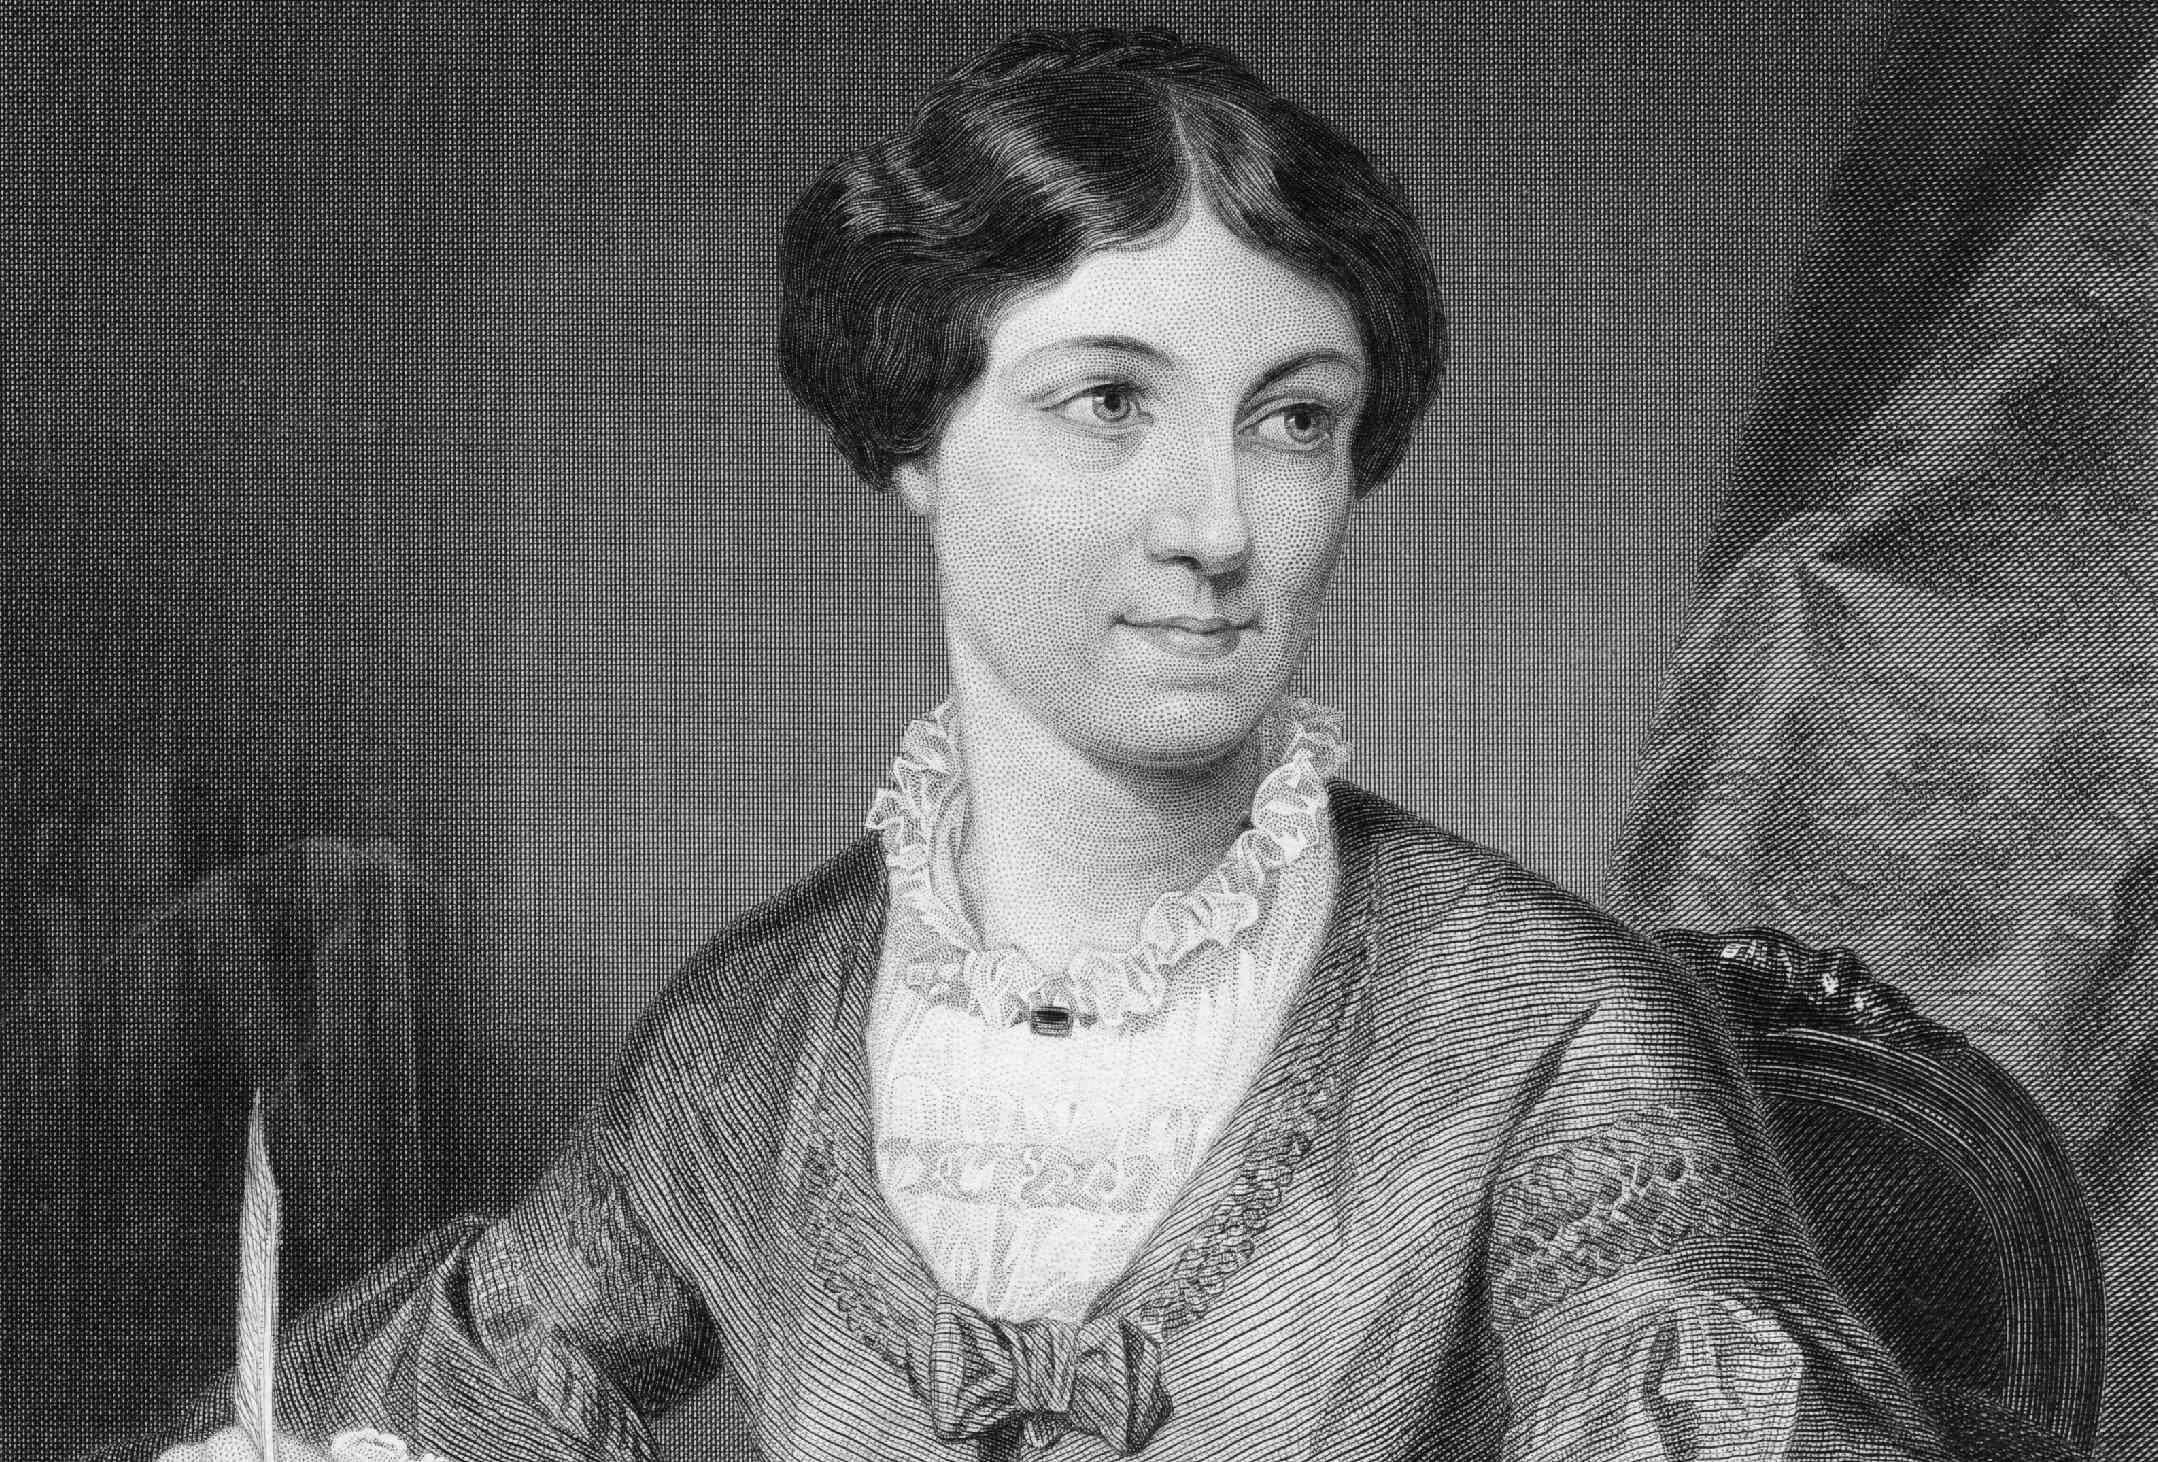 Engraving of Harriet Martineau